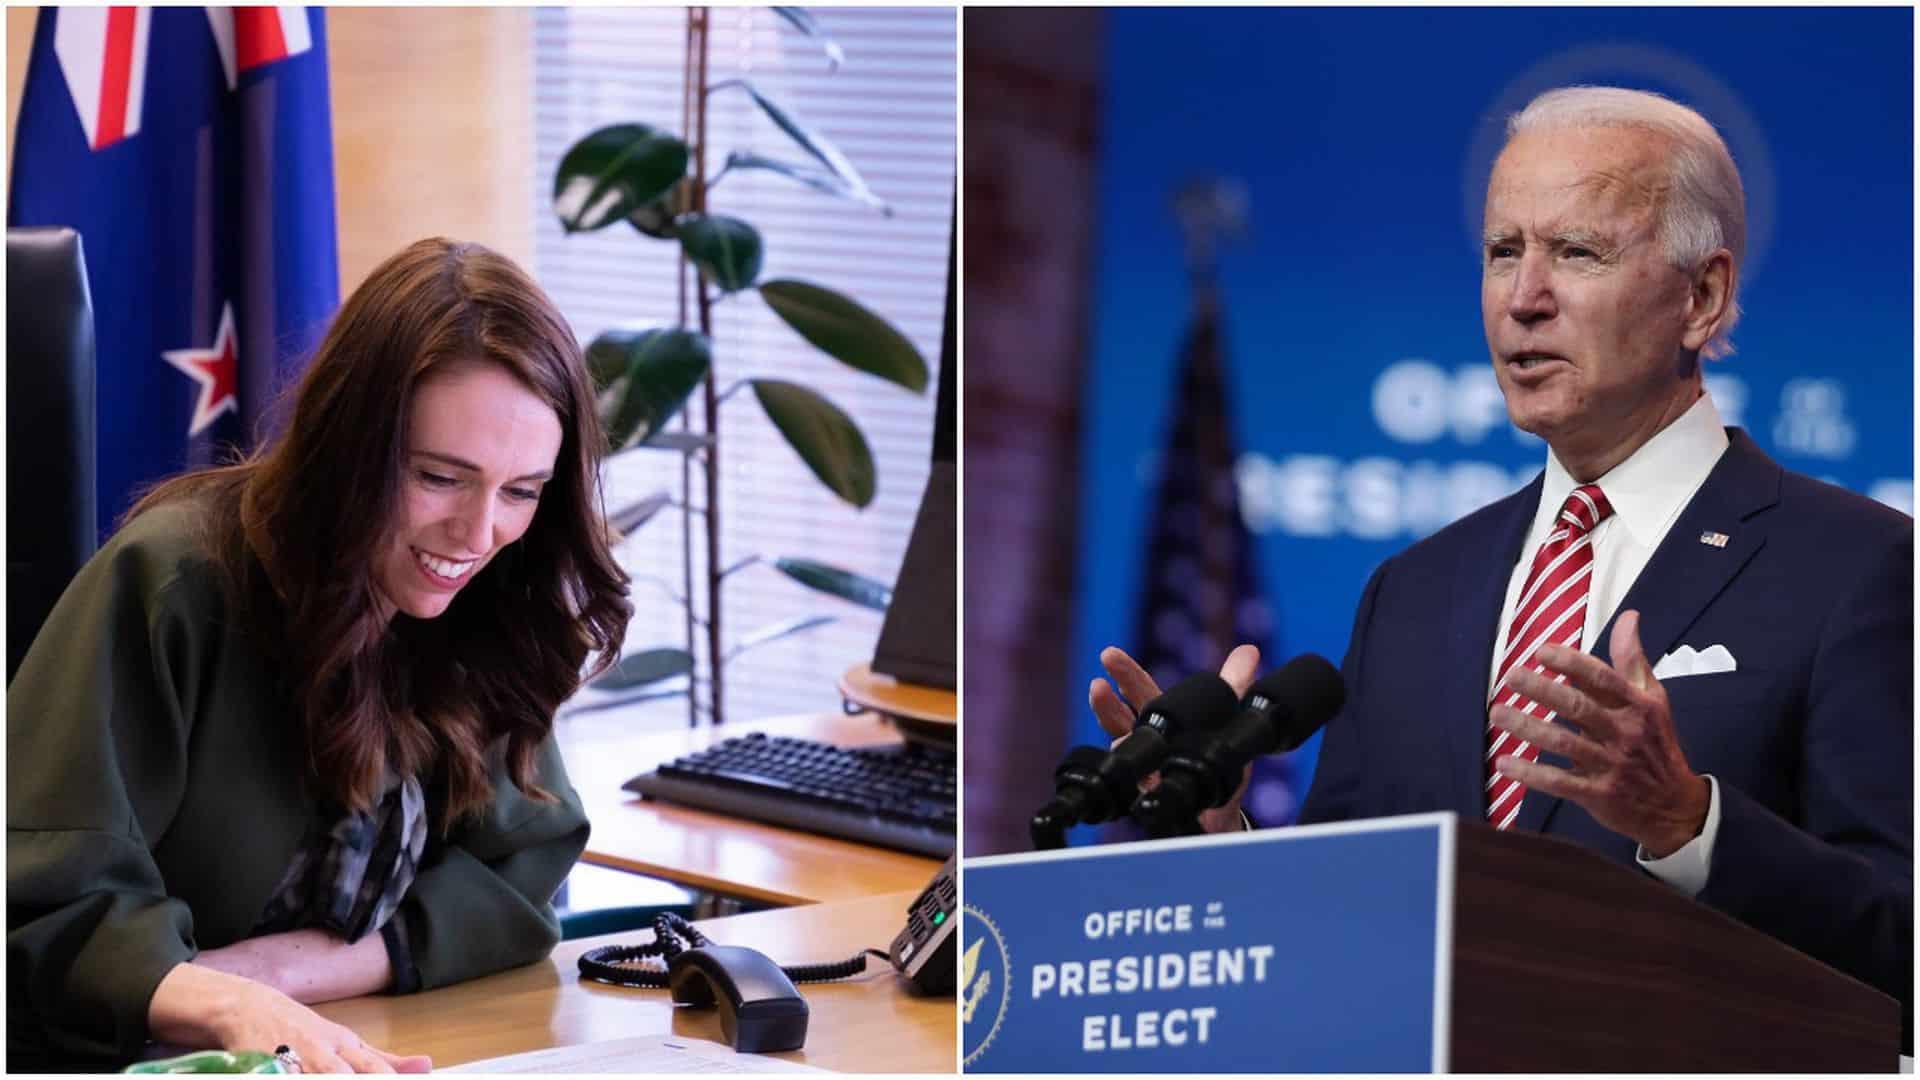 New Zealand Prime Minister Jacinda Ardern and President Joe Biden